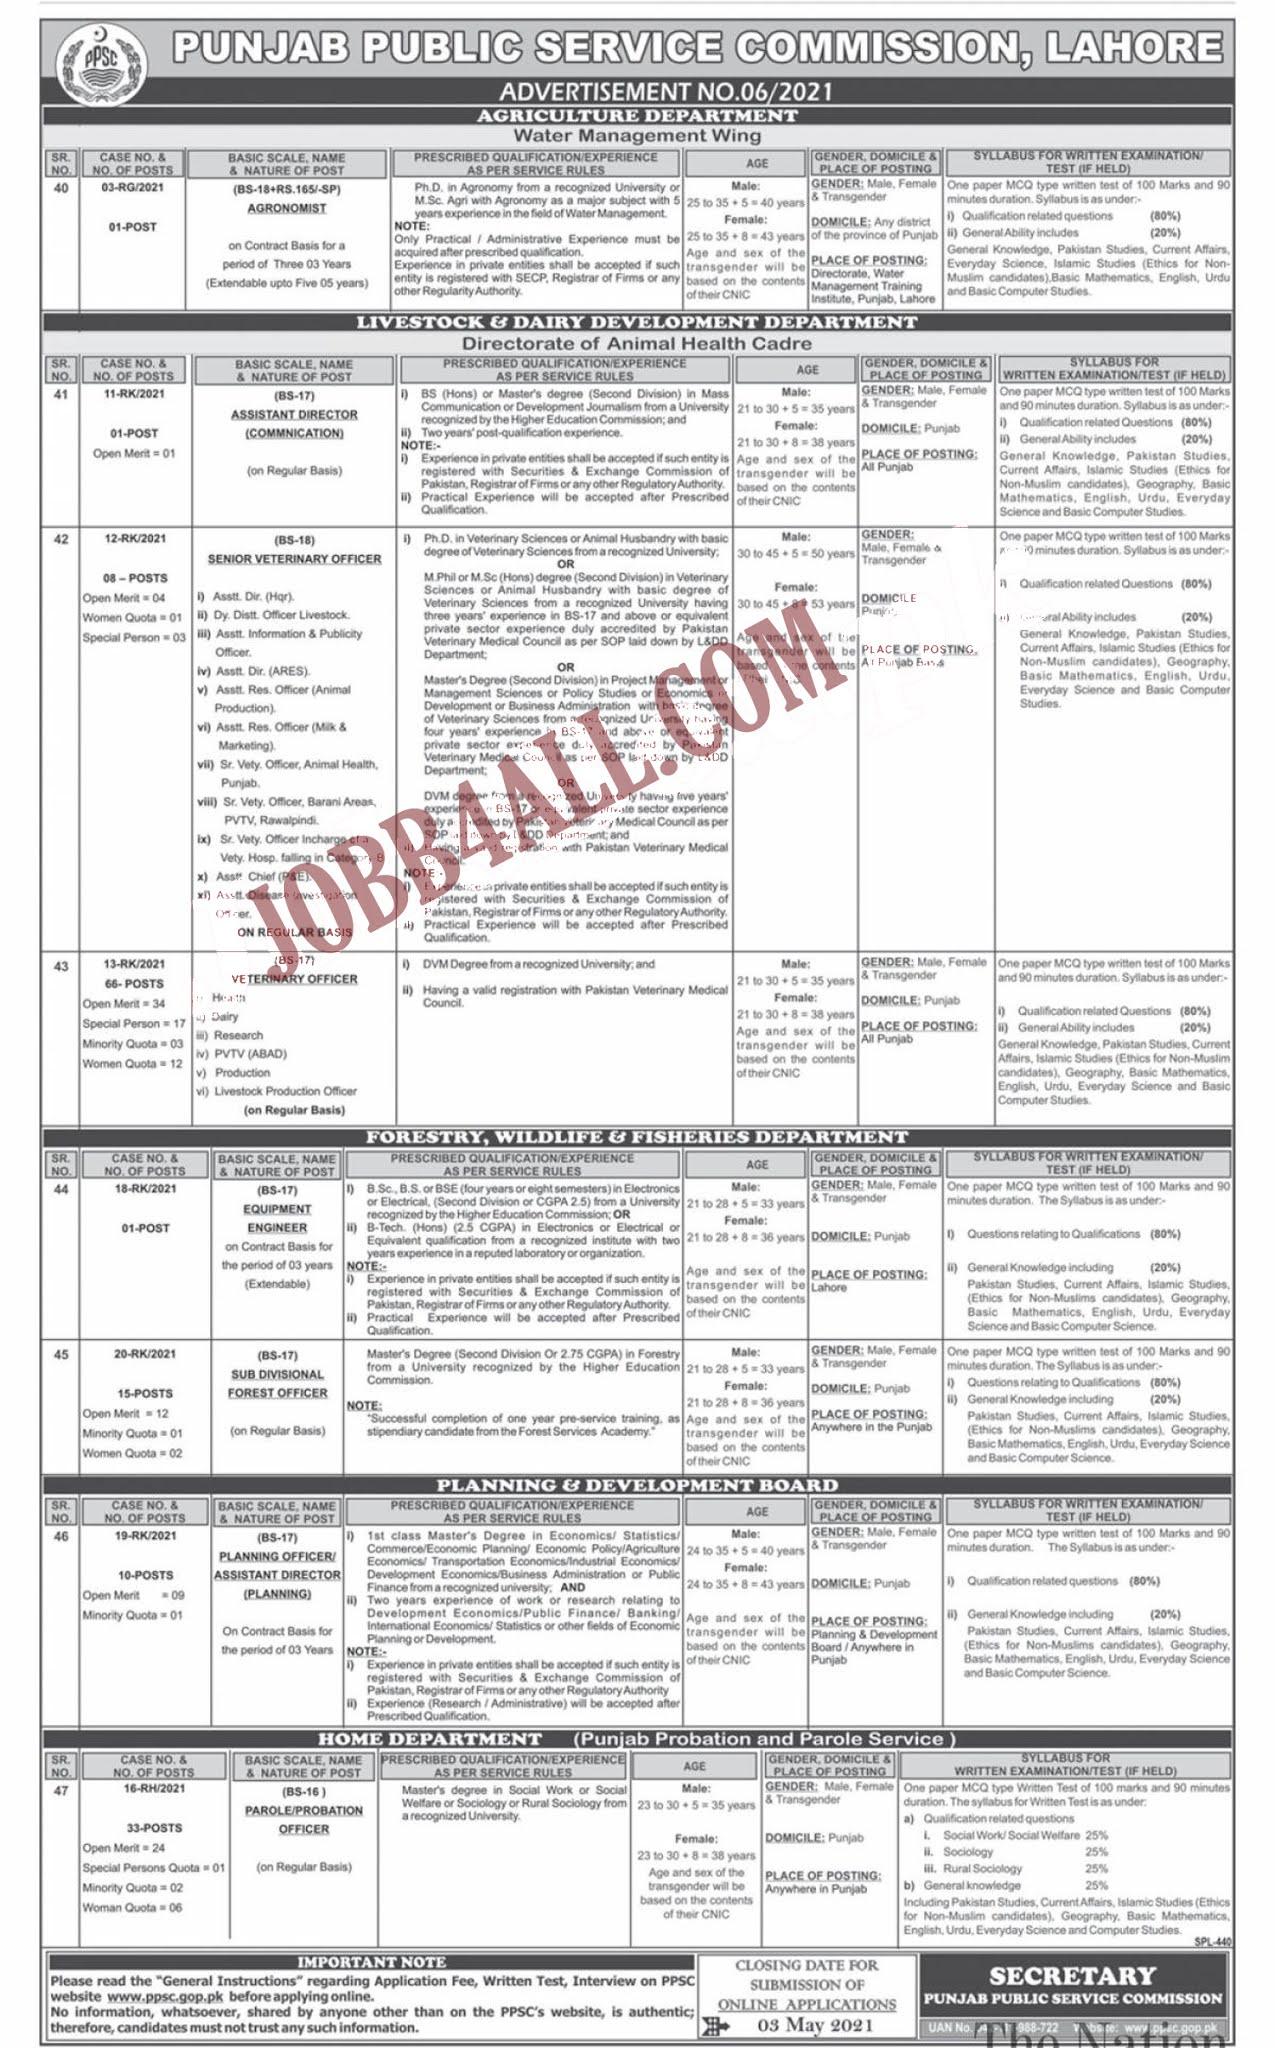 PPSC Jobs 2021 Apply Online Latest Advertisement No 6